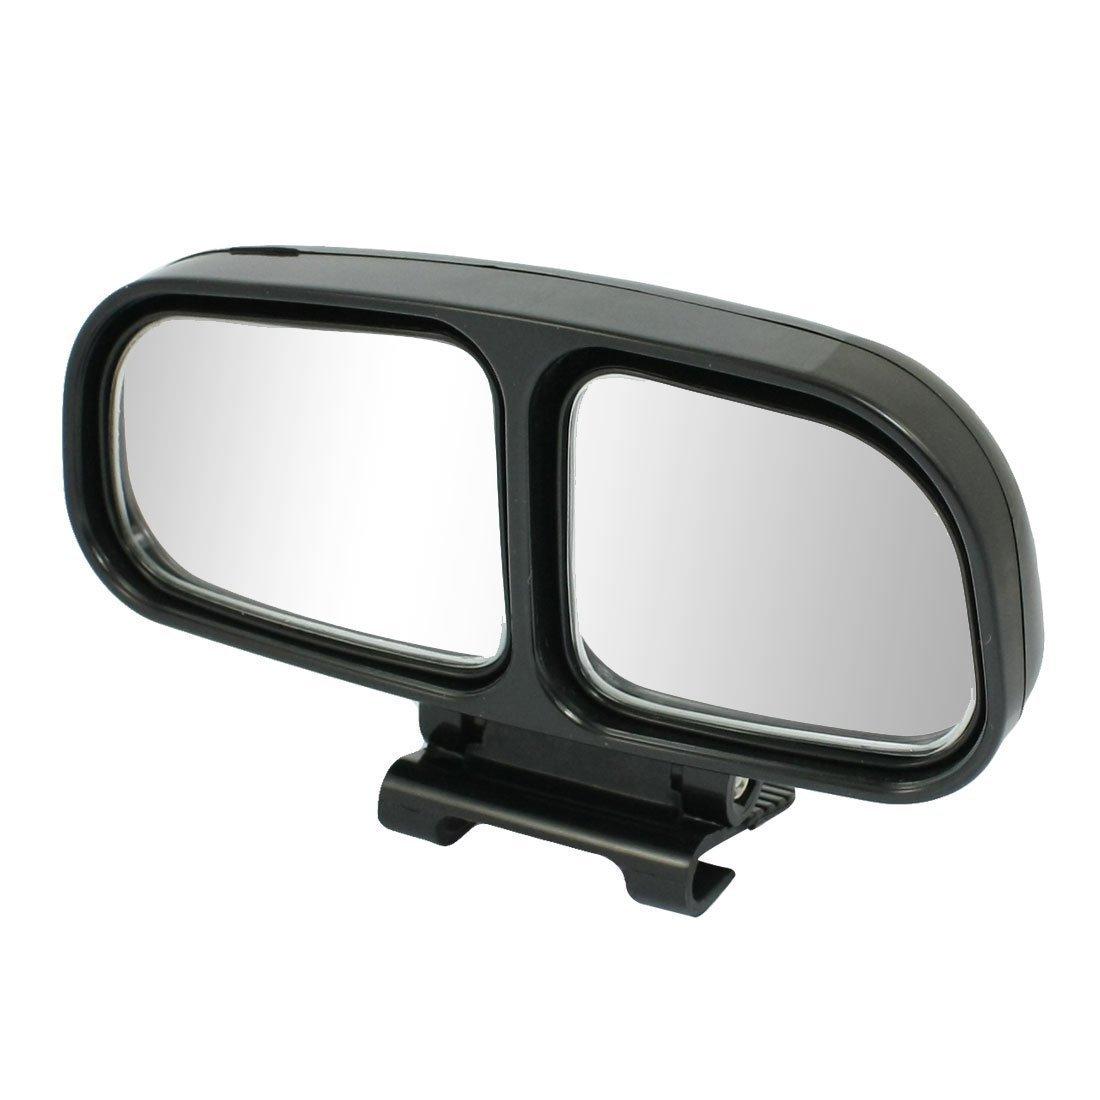 BARGAIN HOUSE Car Blind Mirror Rewind Fan Mirror Car Fan Mirror Black Car Rearview Mirror Car Wide Angle Mirror Car Auto parts